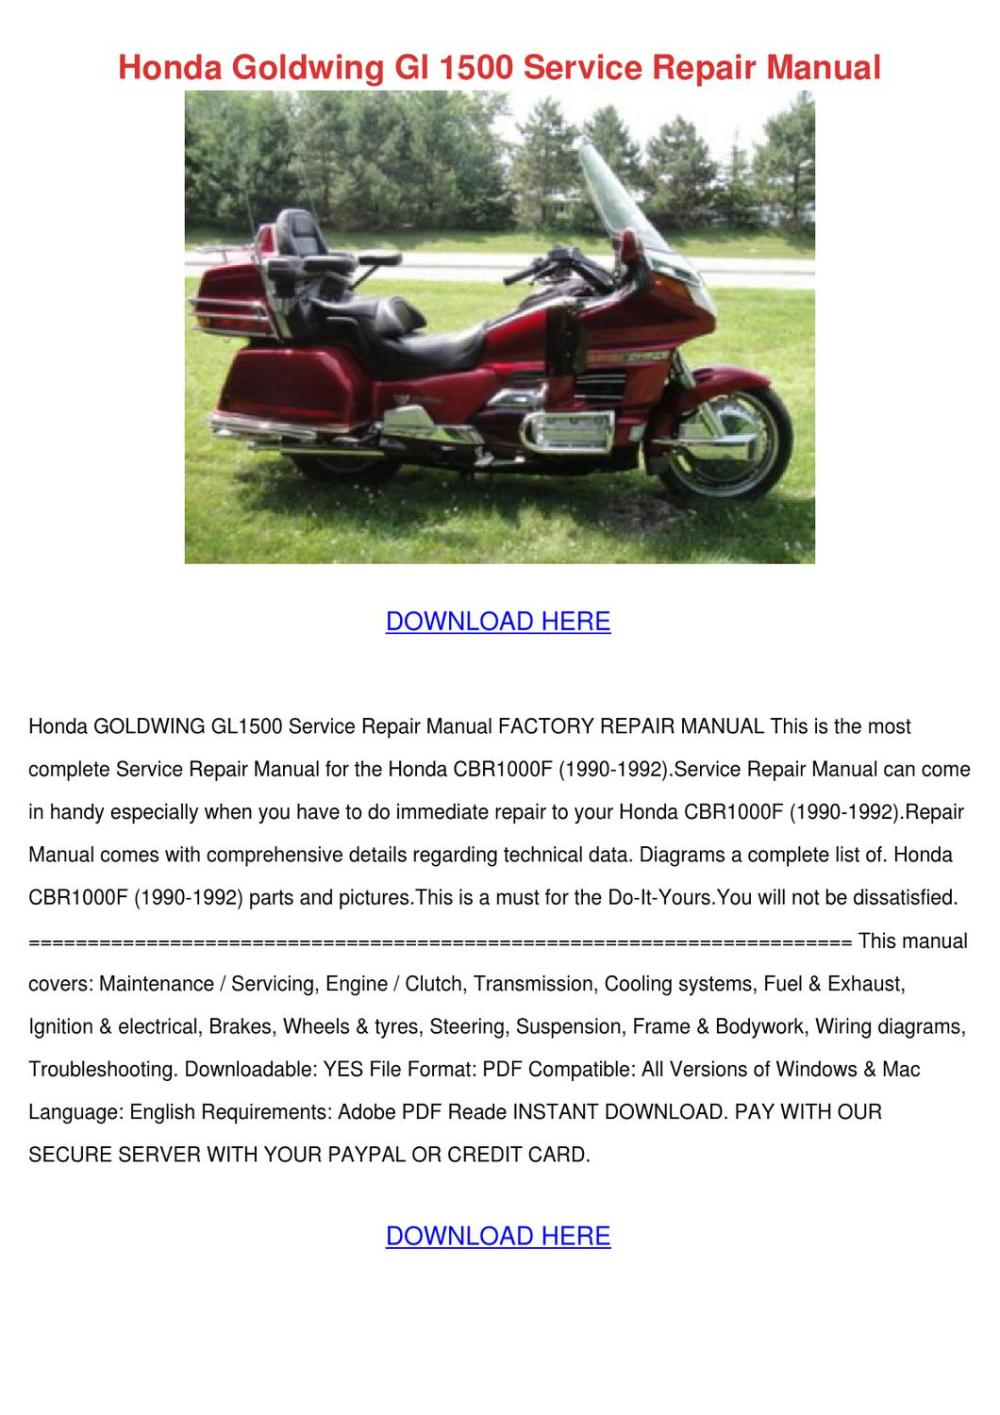 medium resolution of honda goldwing gl 1500 service repair manual